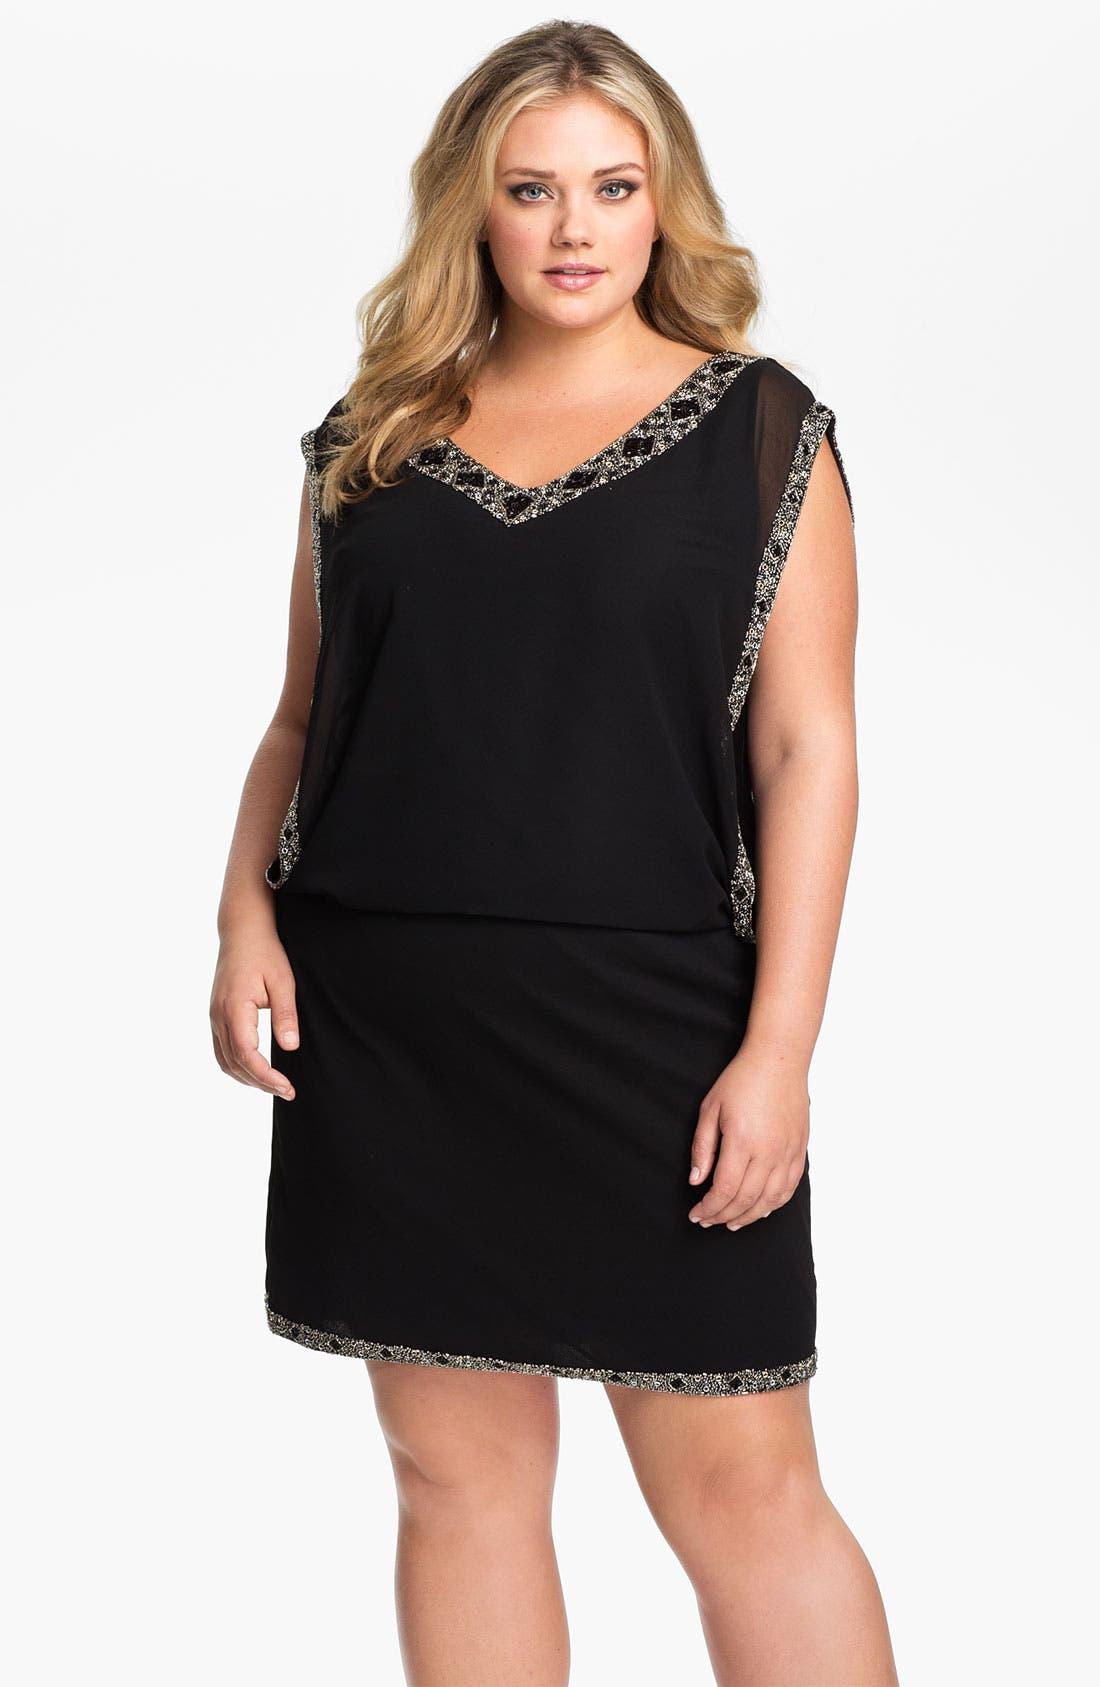 Alternate Image 1 Selected - J Kara Beaded Trim Chiffon Blouson Dress (Plus)